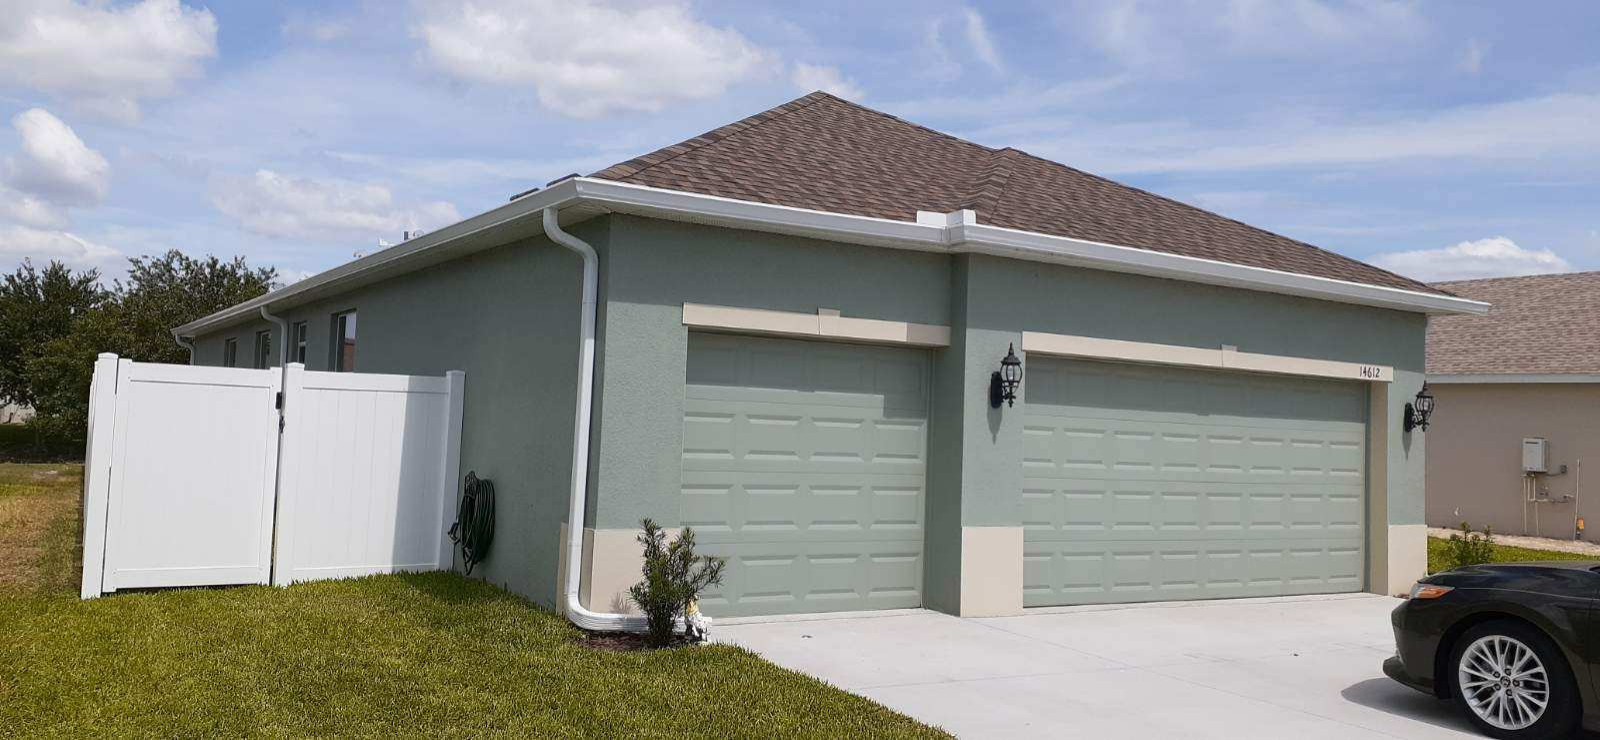 Residential Gutters - Standard